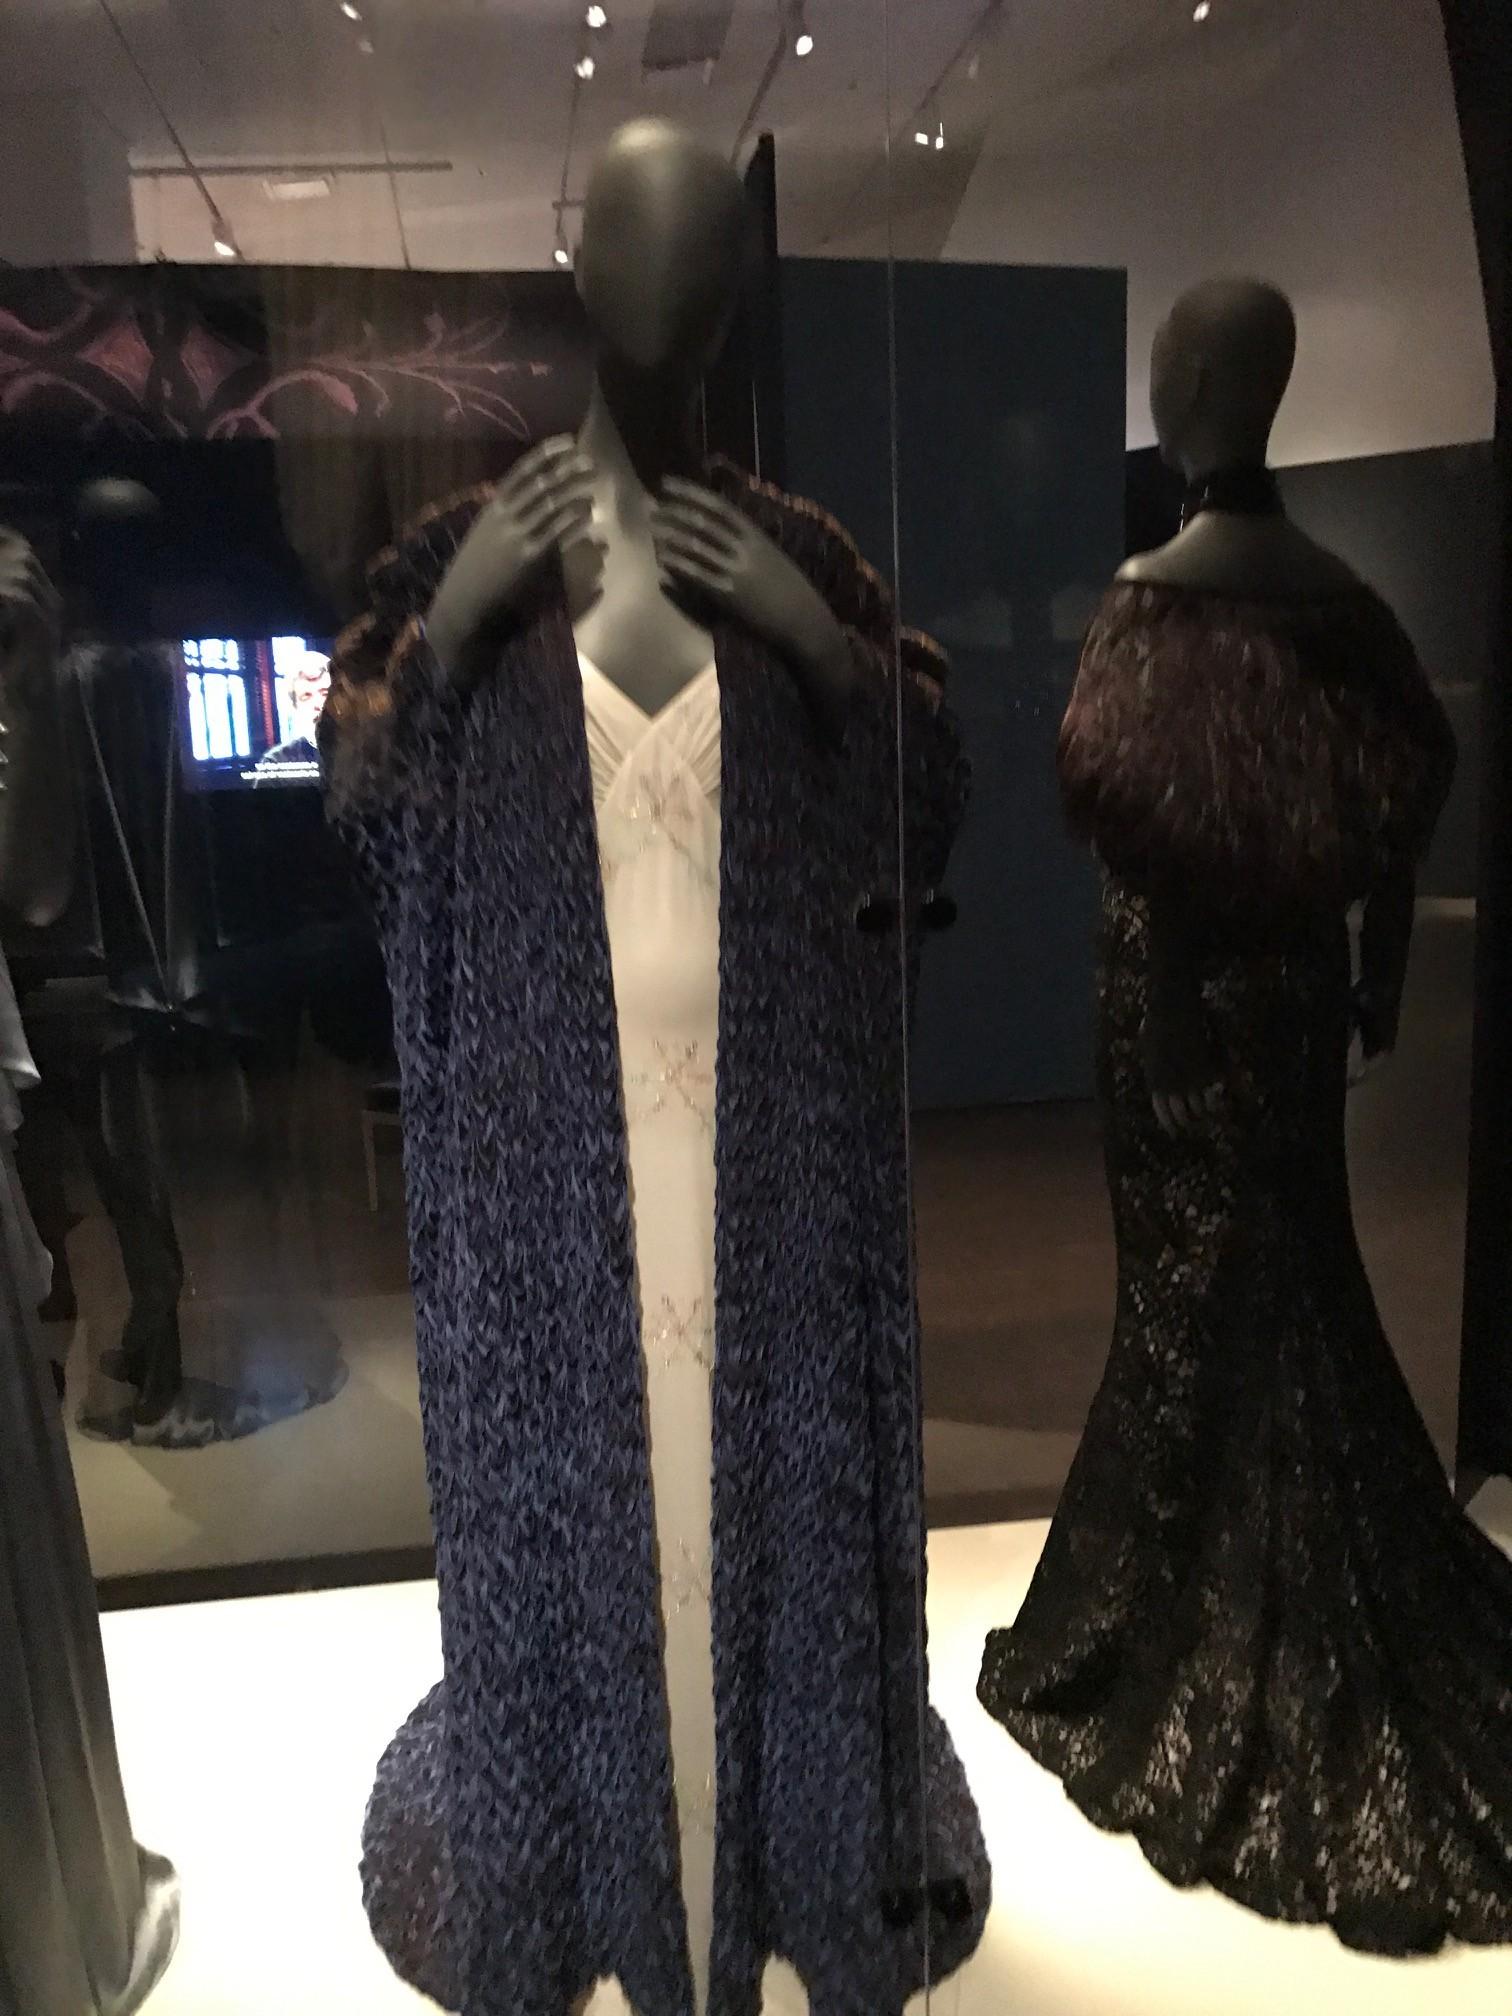 Star Wars Costume Spotlight Padme Amadala S Dresses